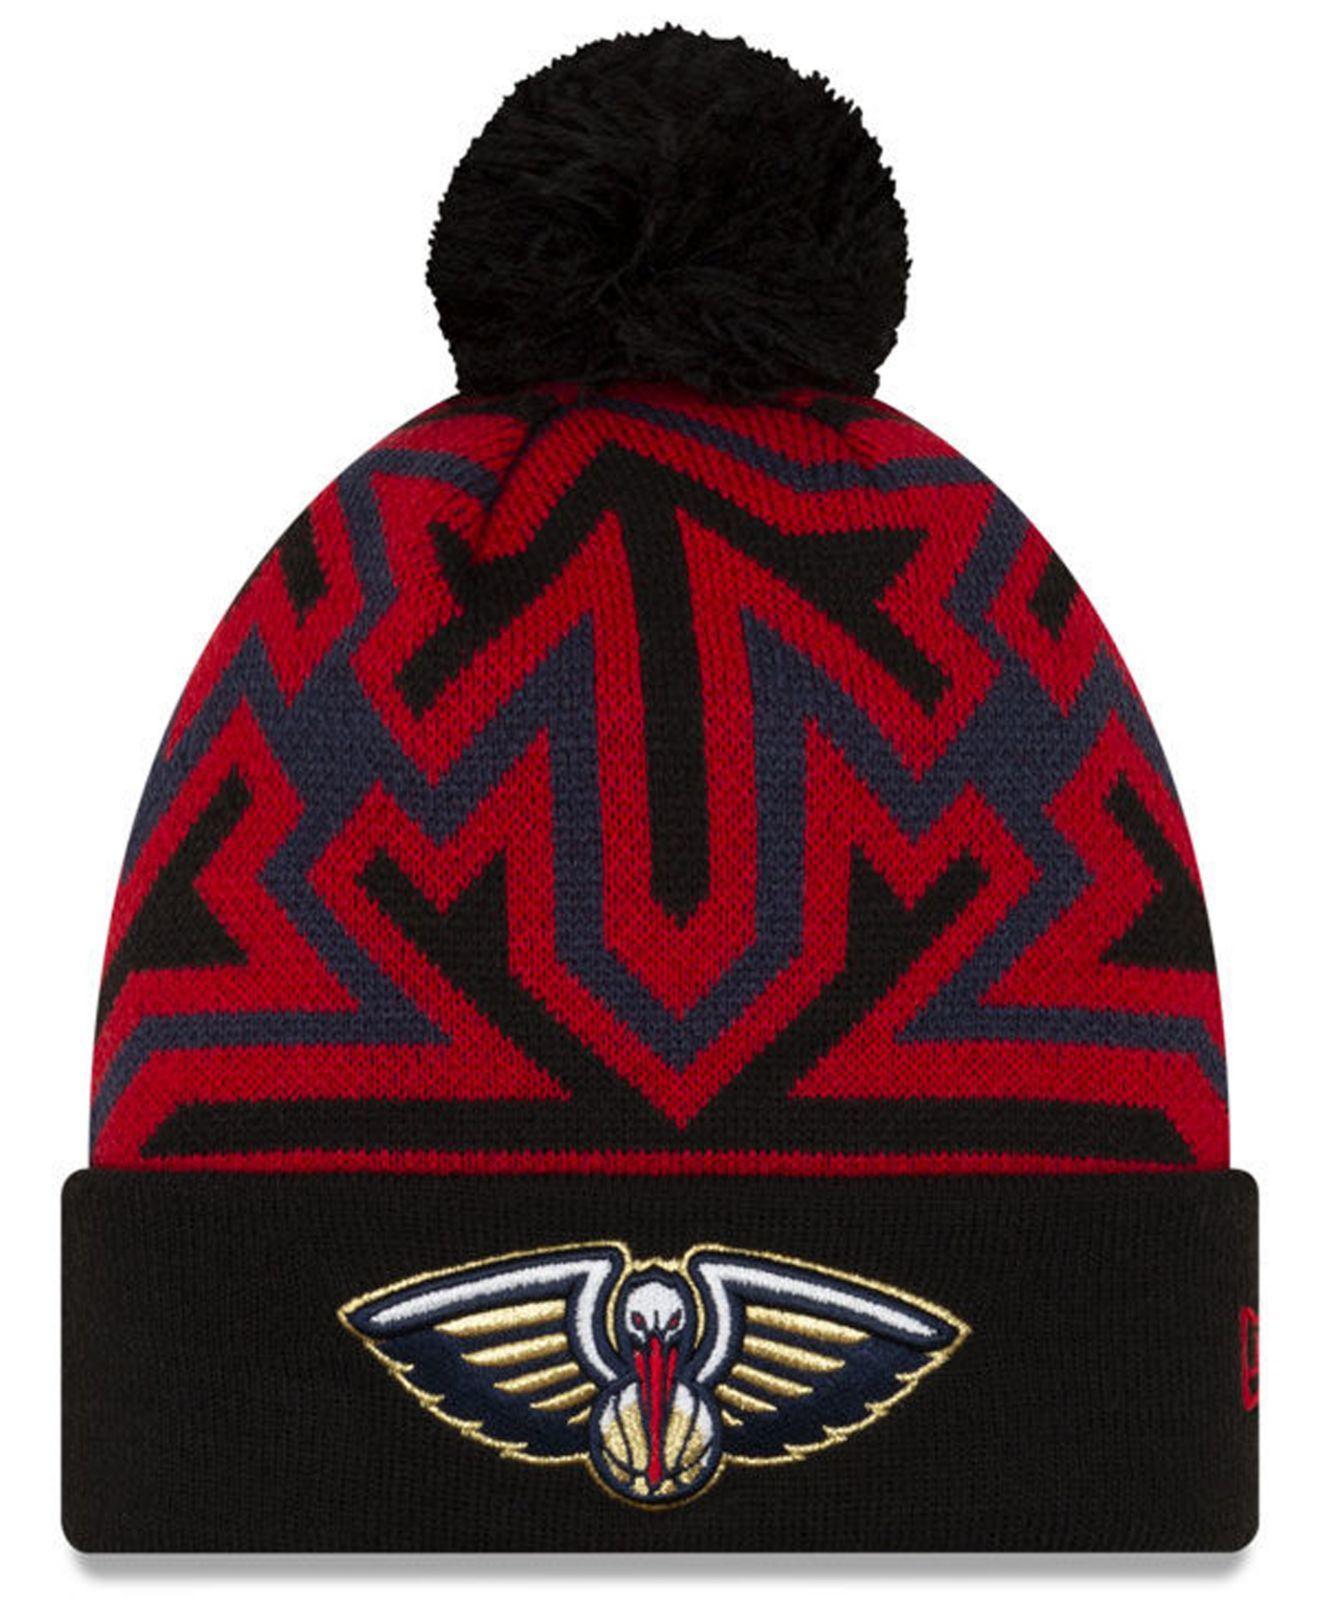 New Orleans Pelicans Big Flake Pom Knit Hat